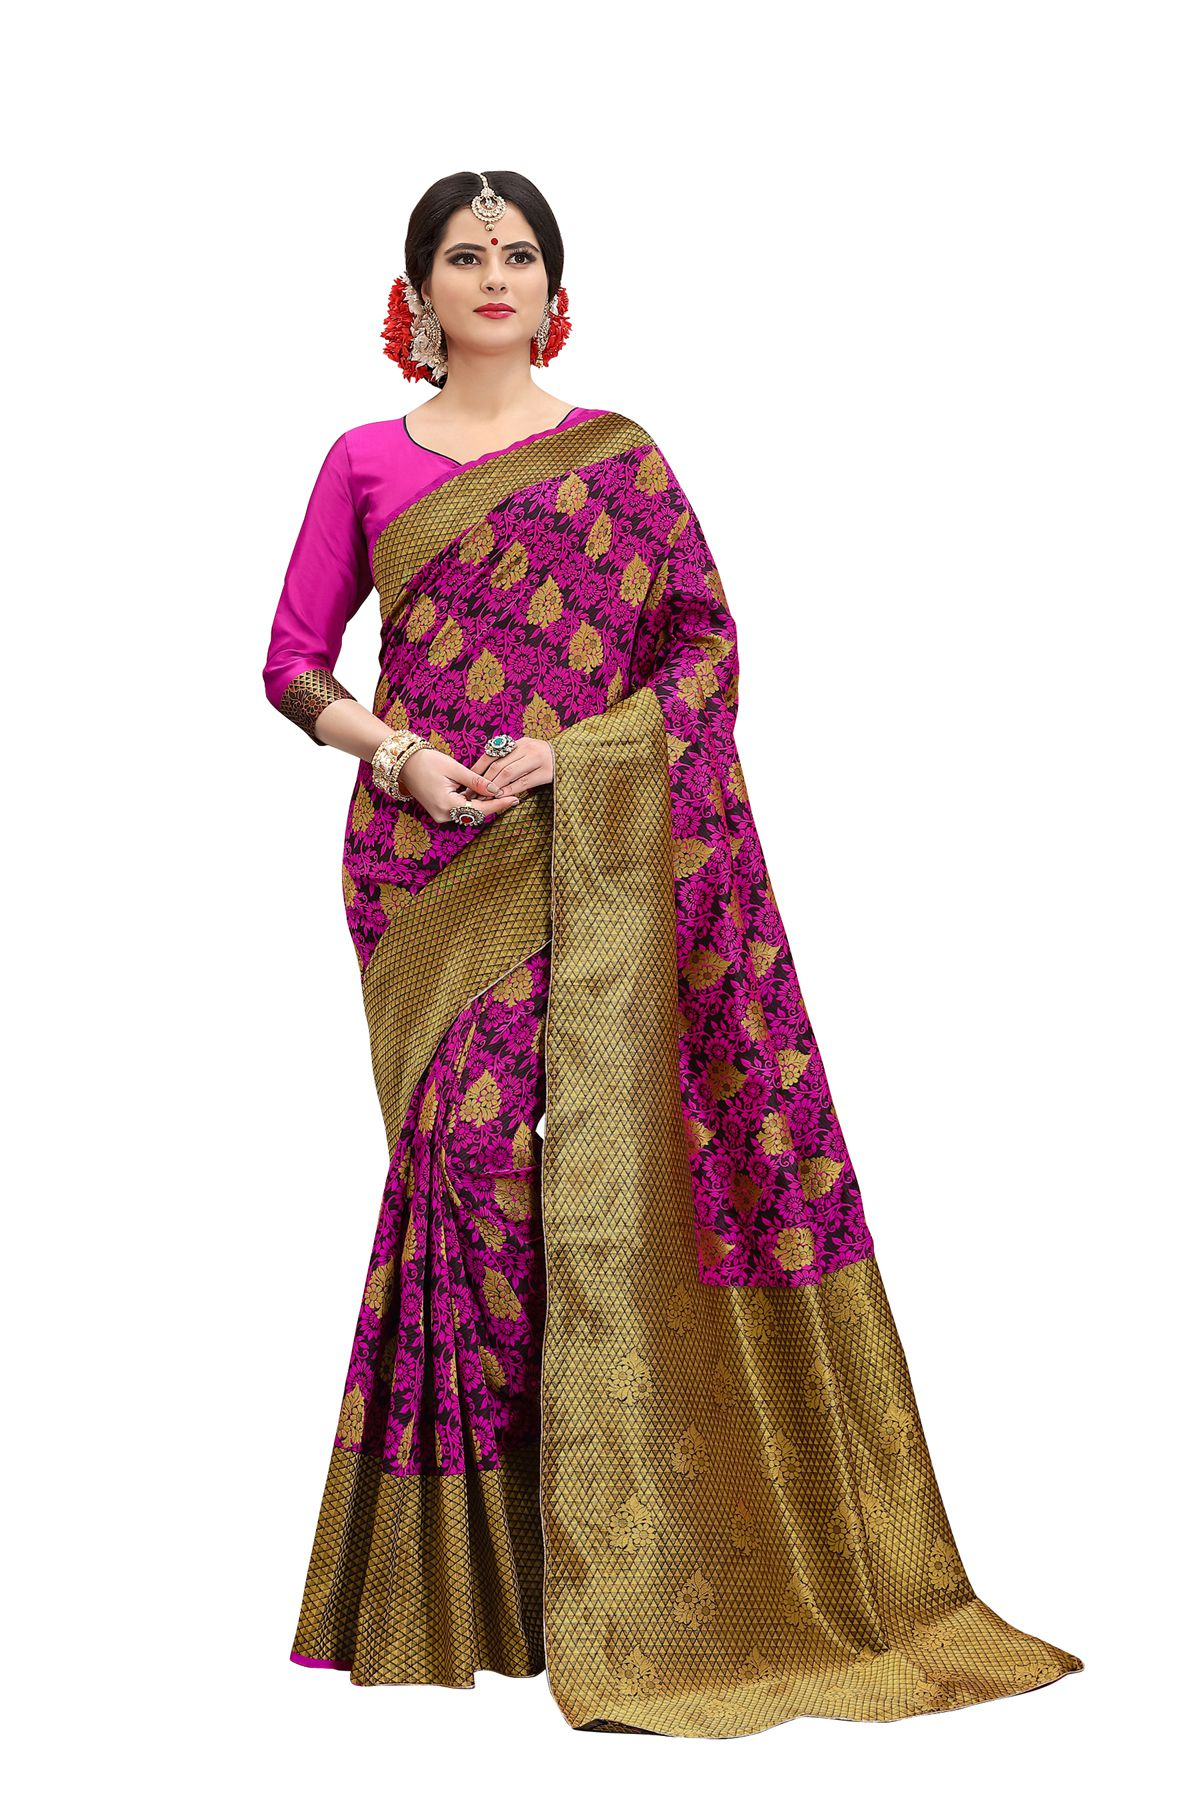 Rekishn Pink Banarasi Silk Saree